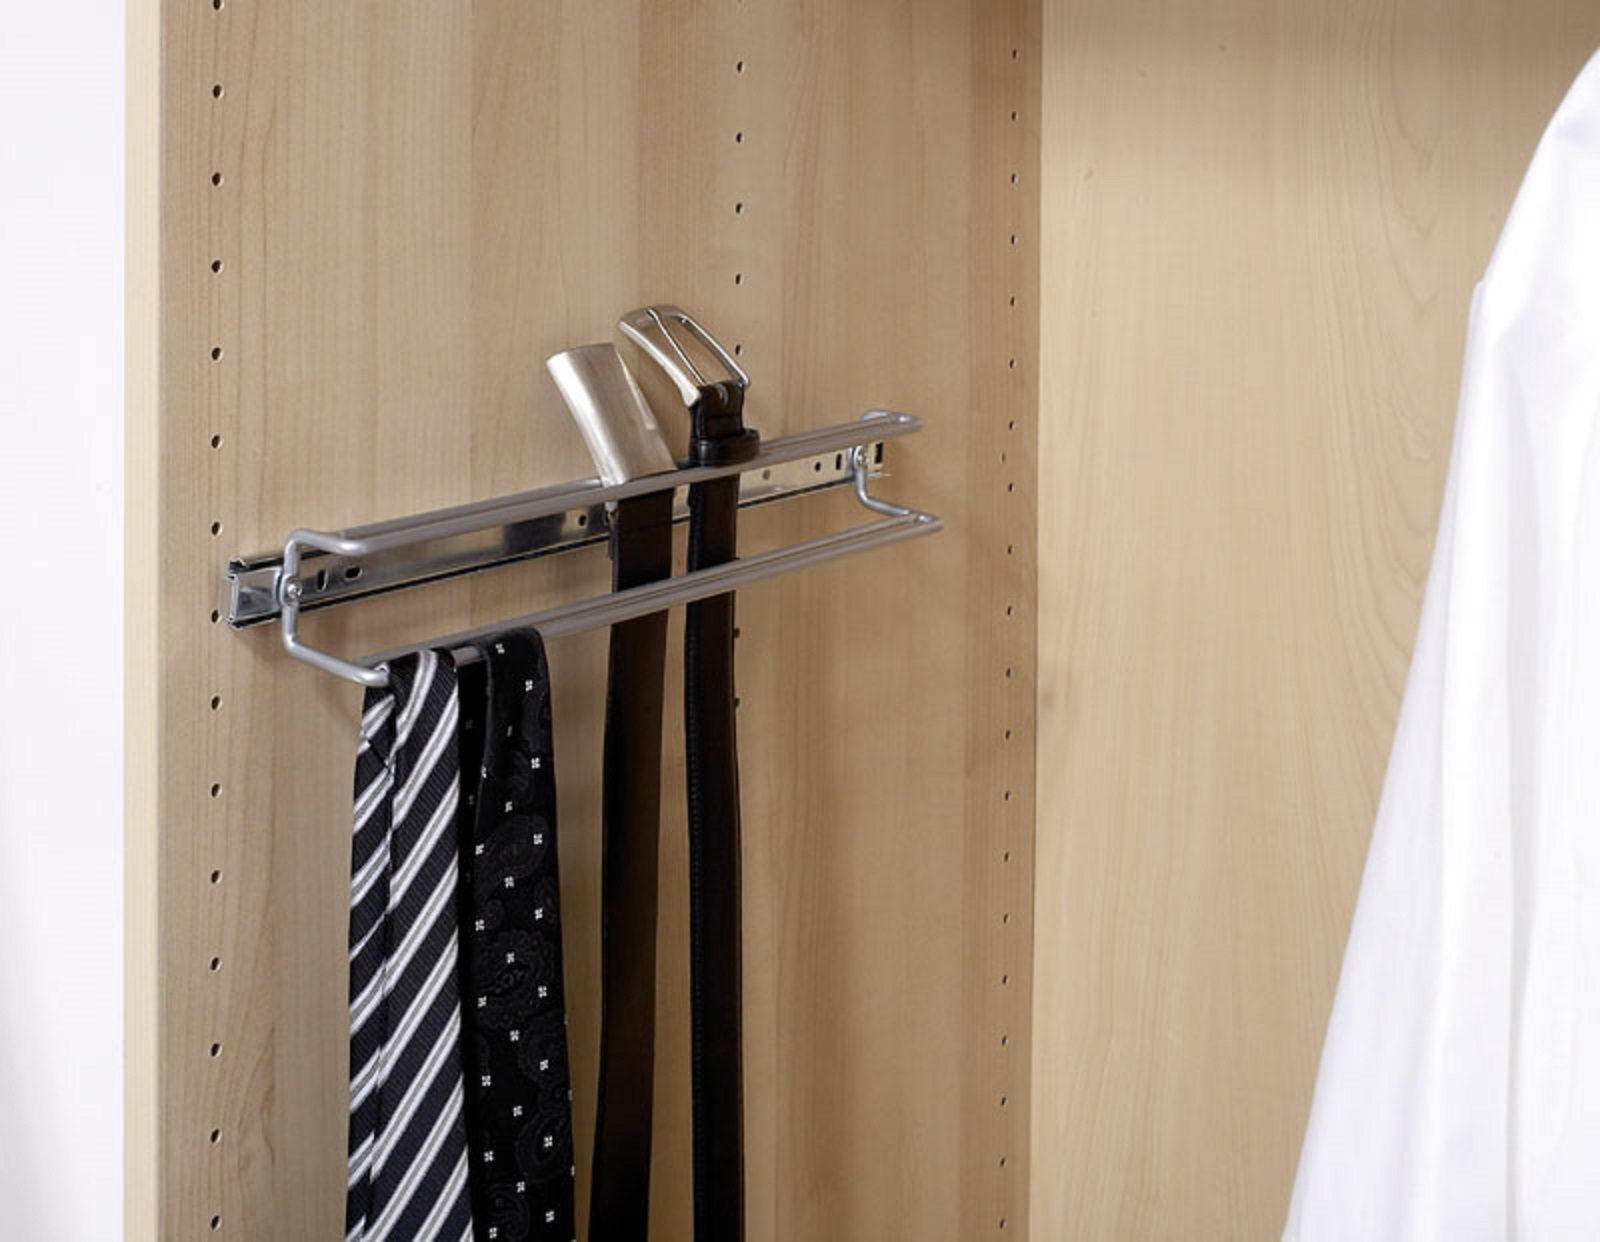 teleskop schrankauszug teleskopauszug krawattenhalter tuchhalter g rtelhalter ebay. Black Bedroom Furniture Sets. Home Design Ideas